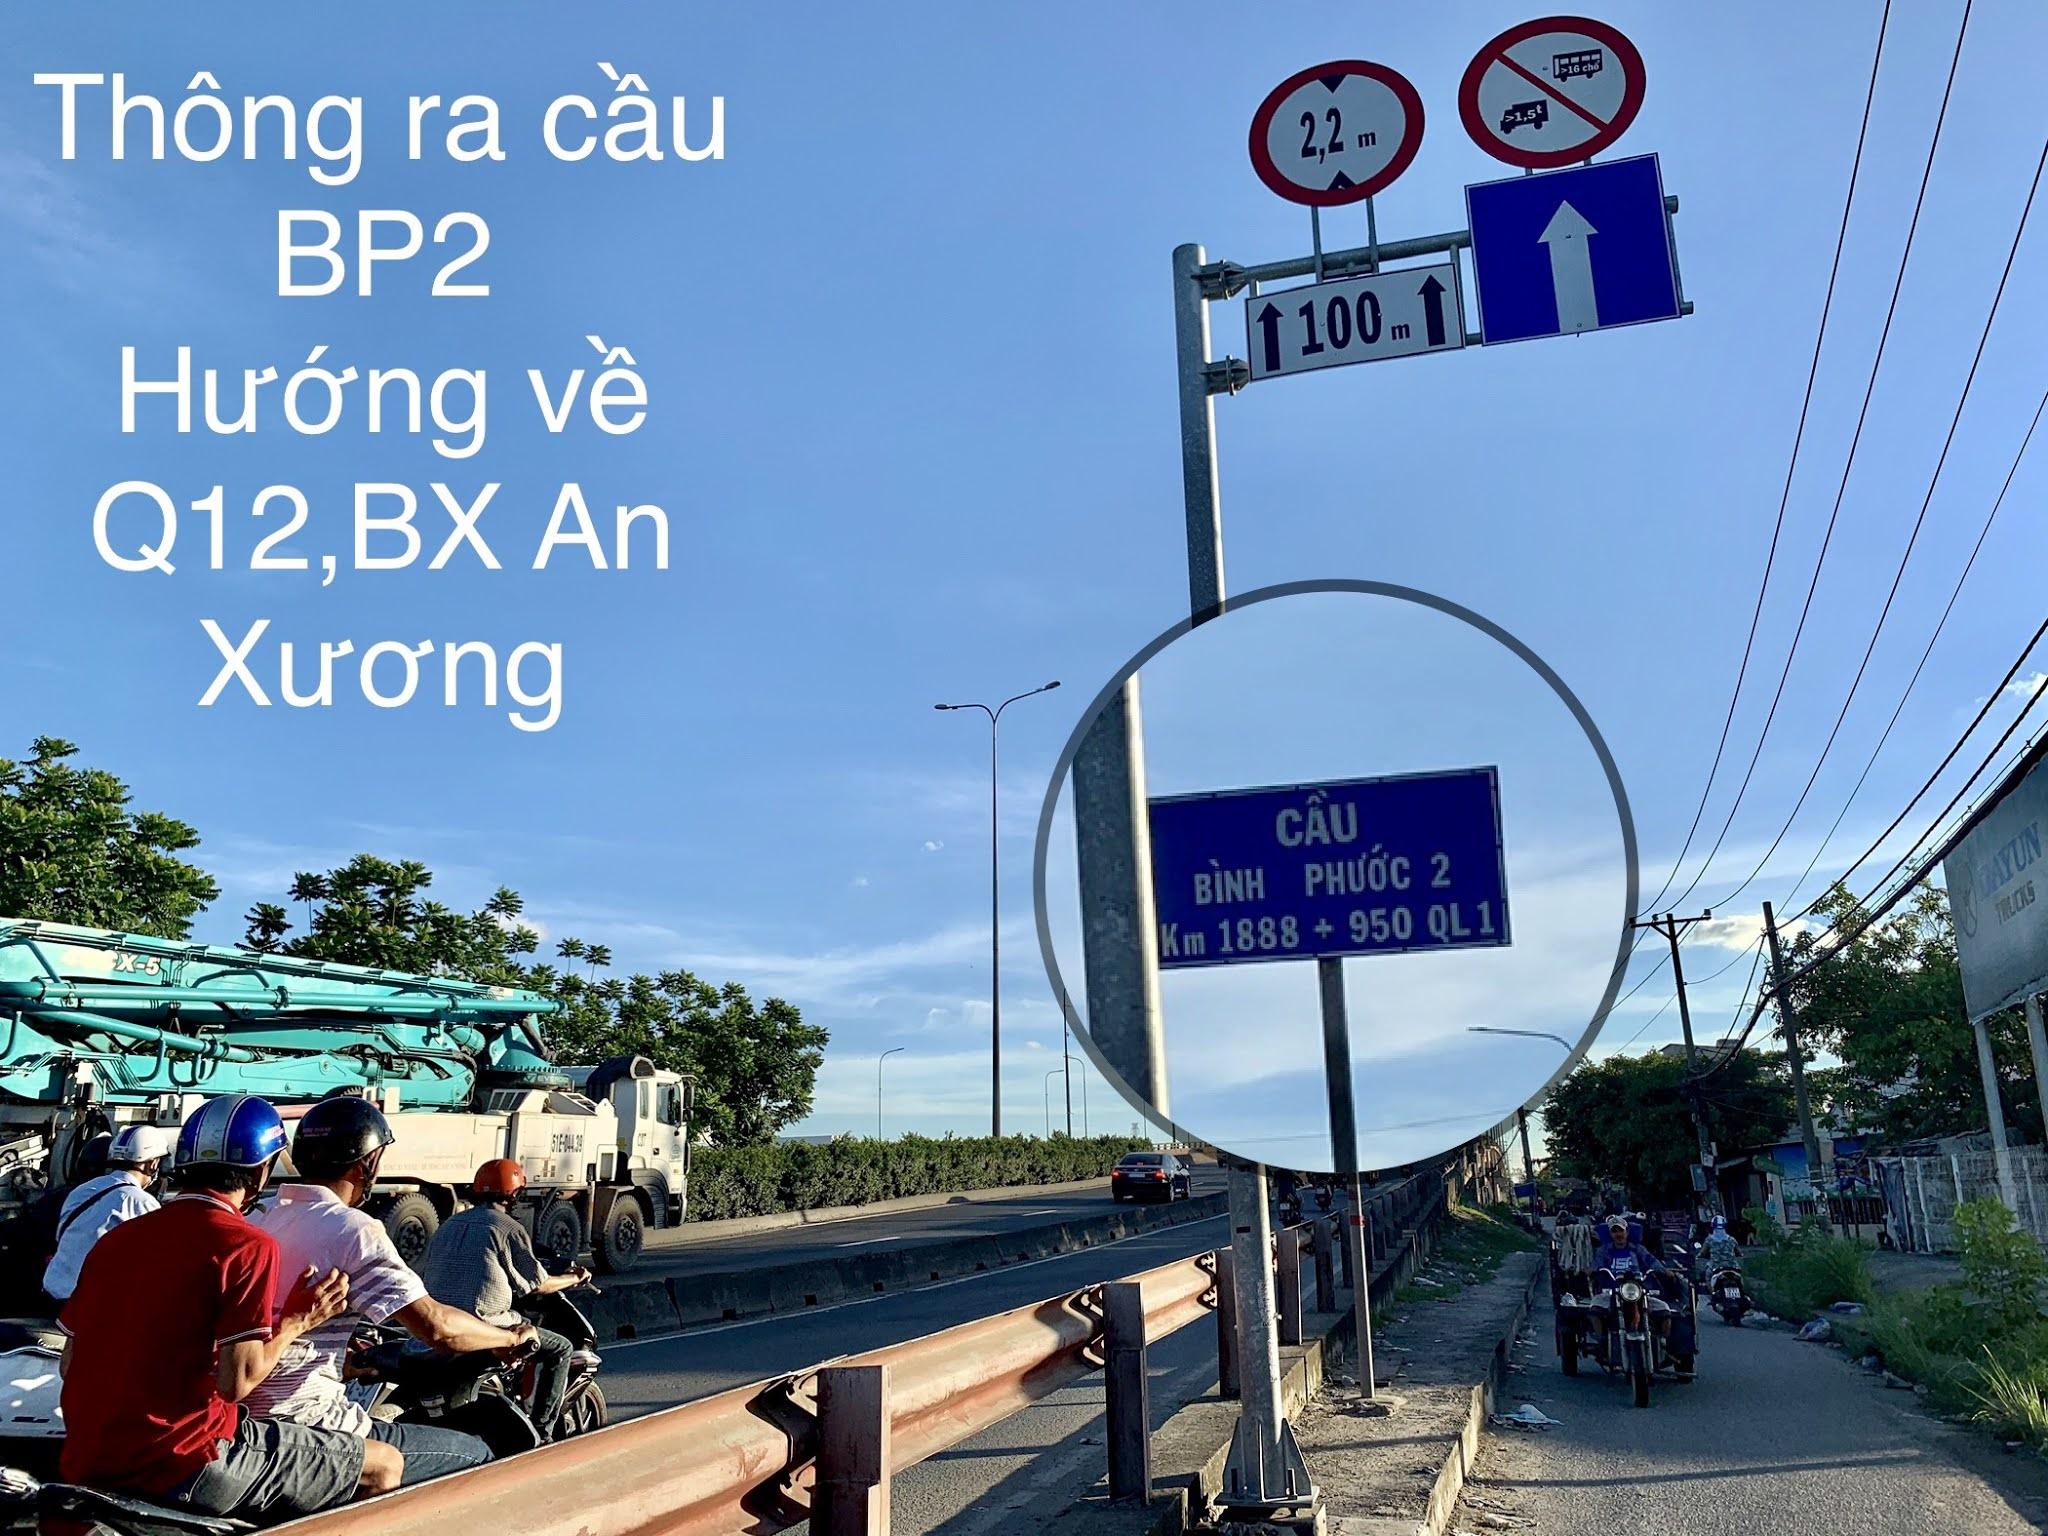 nhadatthienlong.com